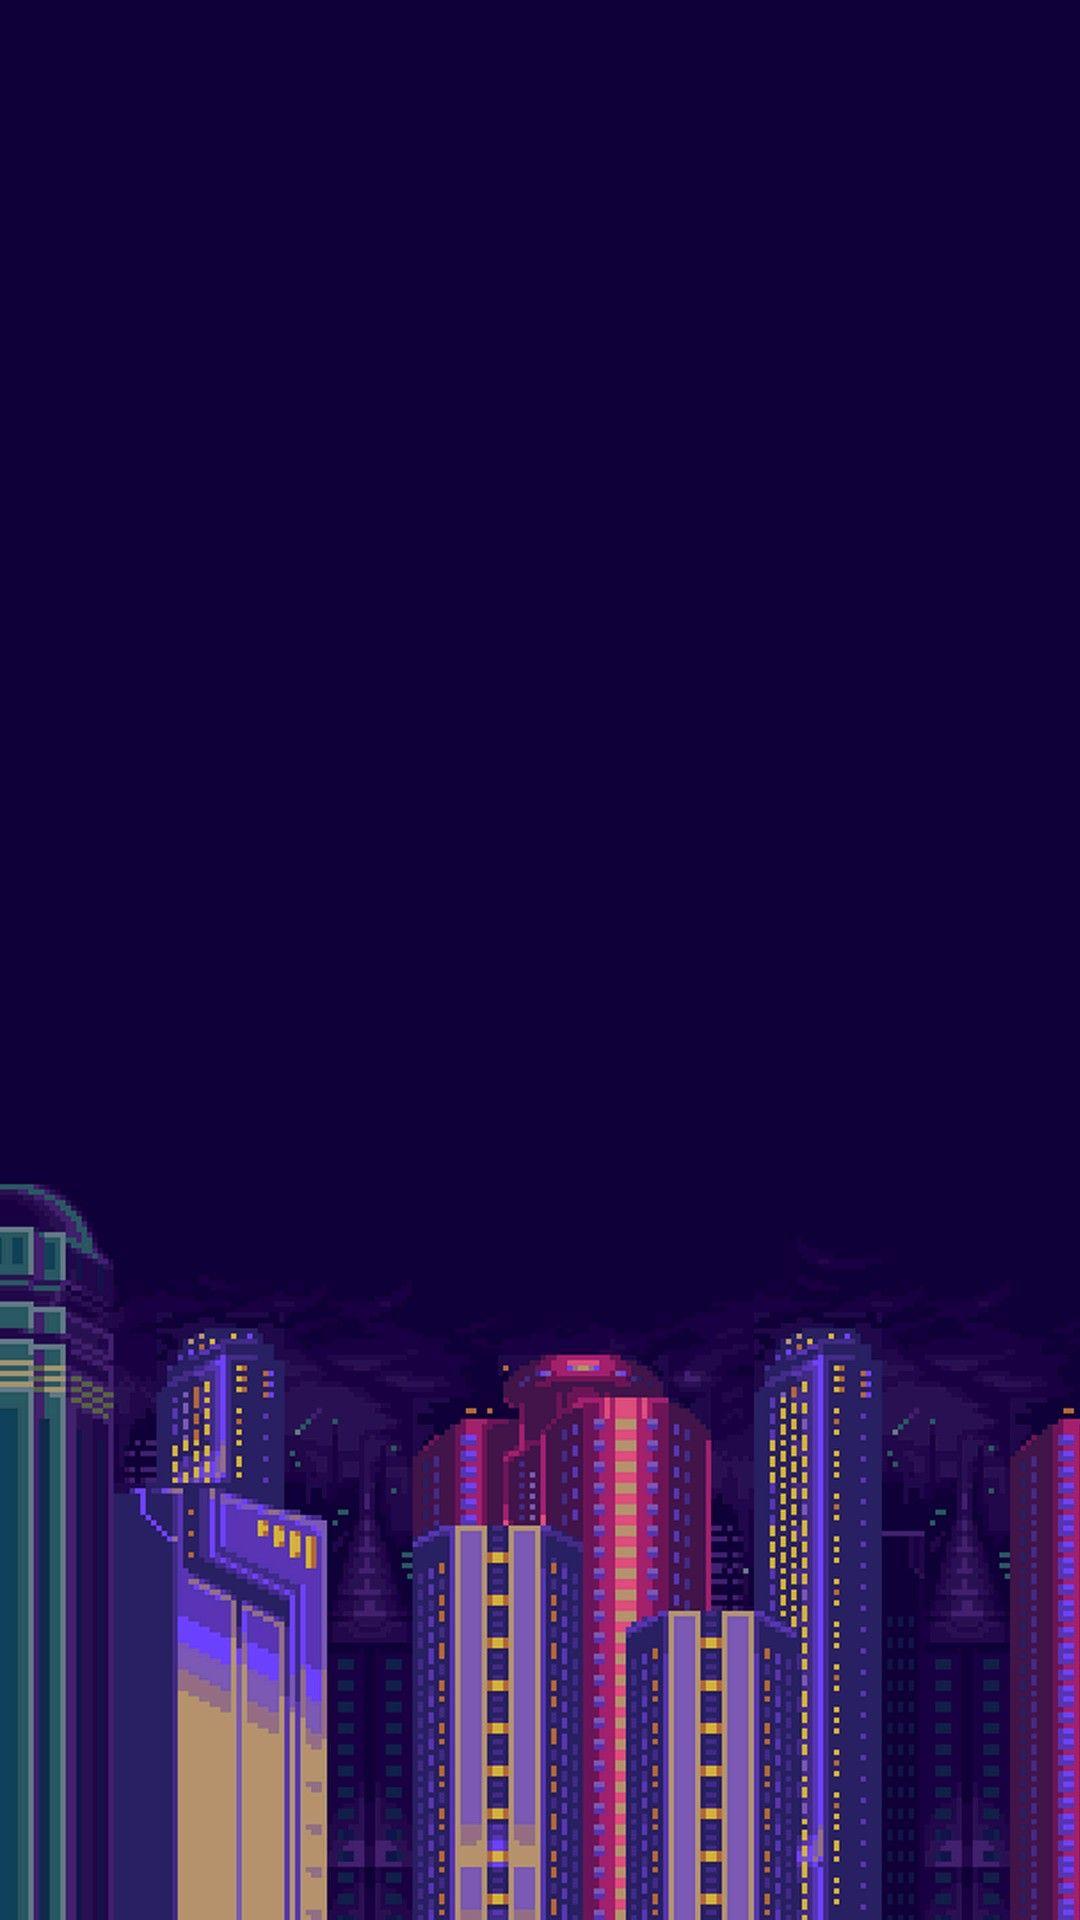 Rgb Color Wheel, Calming Images, Skyline Painting, Retro Video Games, Vaporwave,